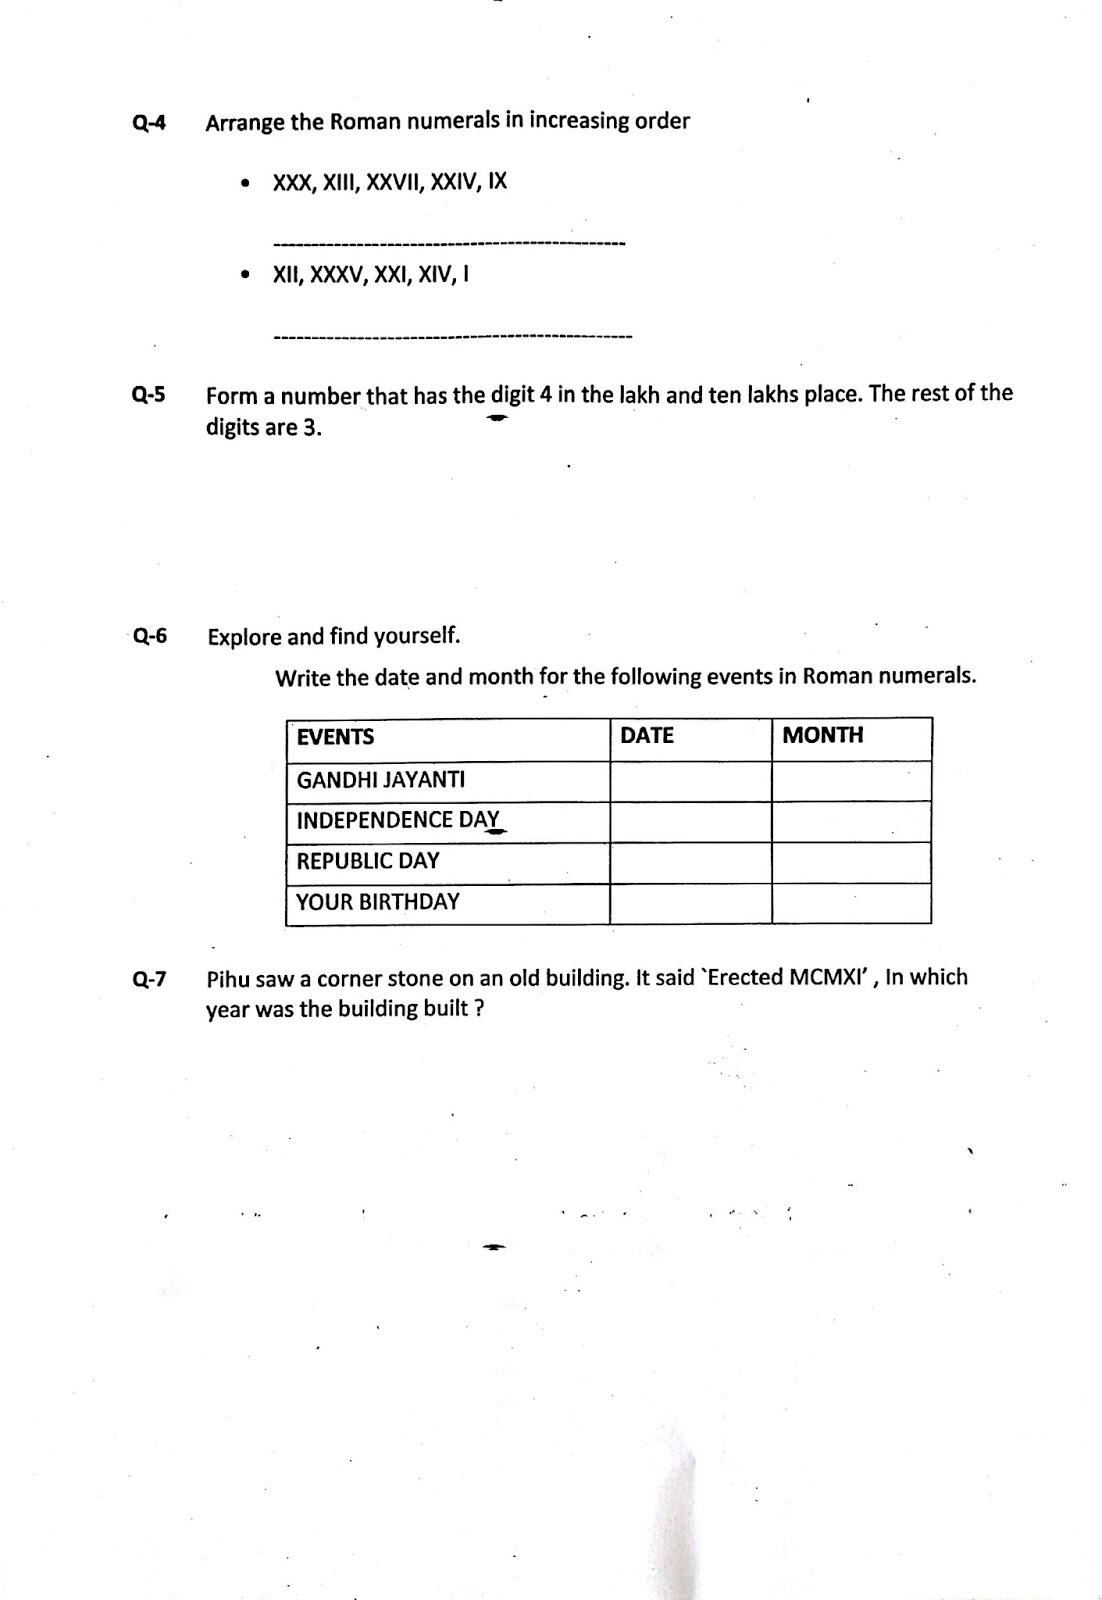 Grade 5 podar international school gandhinagar maths holiday maths holiday worksheet ibookread PDF